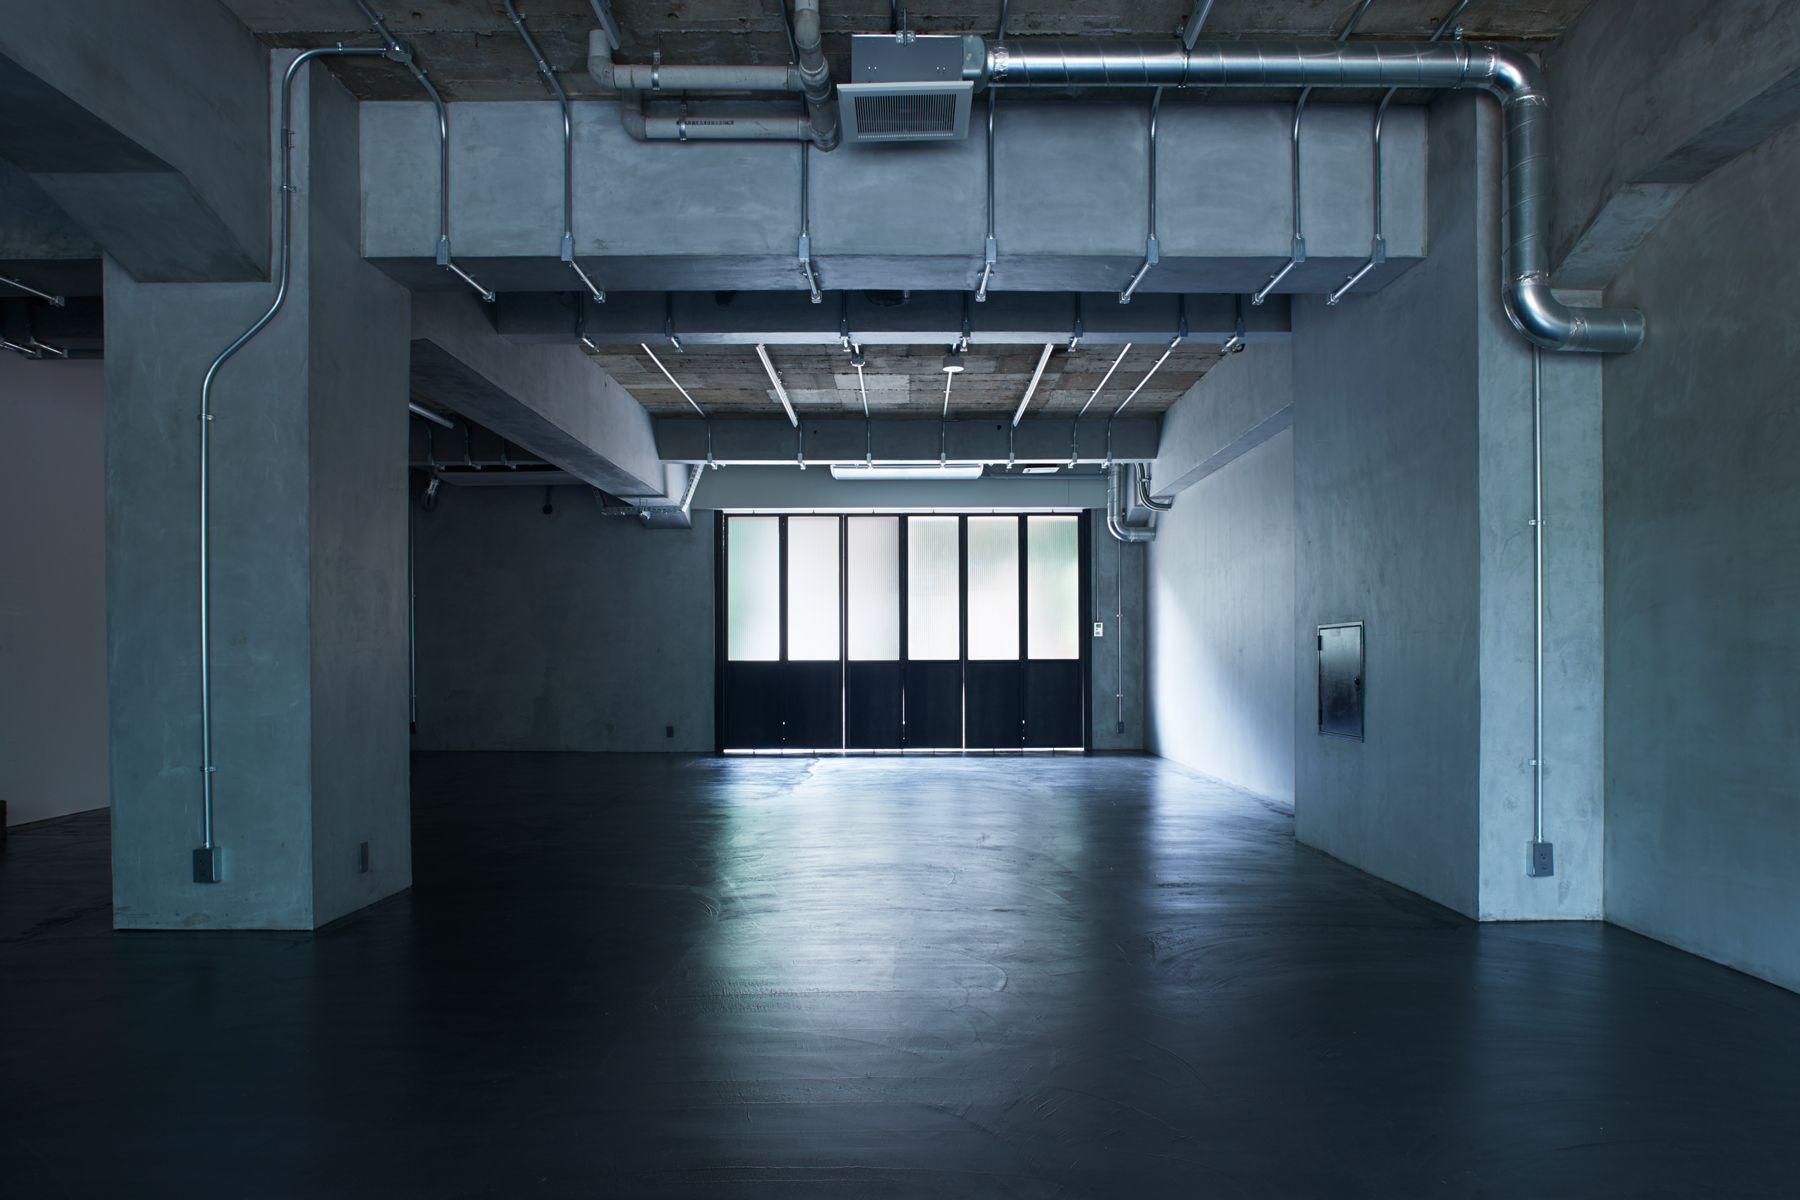 noru studio (ノル スタジオ)